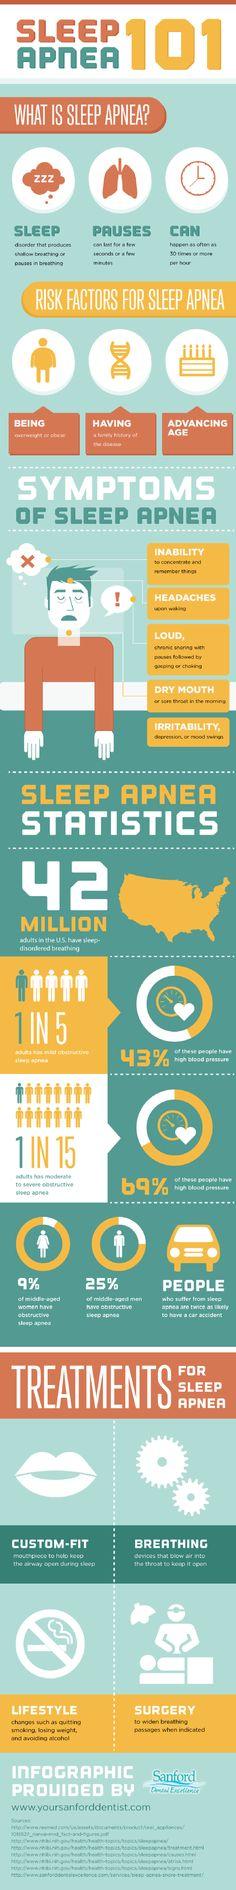 Sleep Apnea 101 #Infographics #Health #Image — Lightscap3s.com